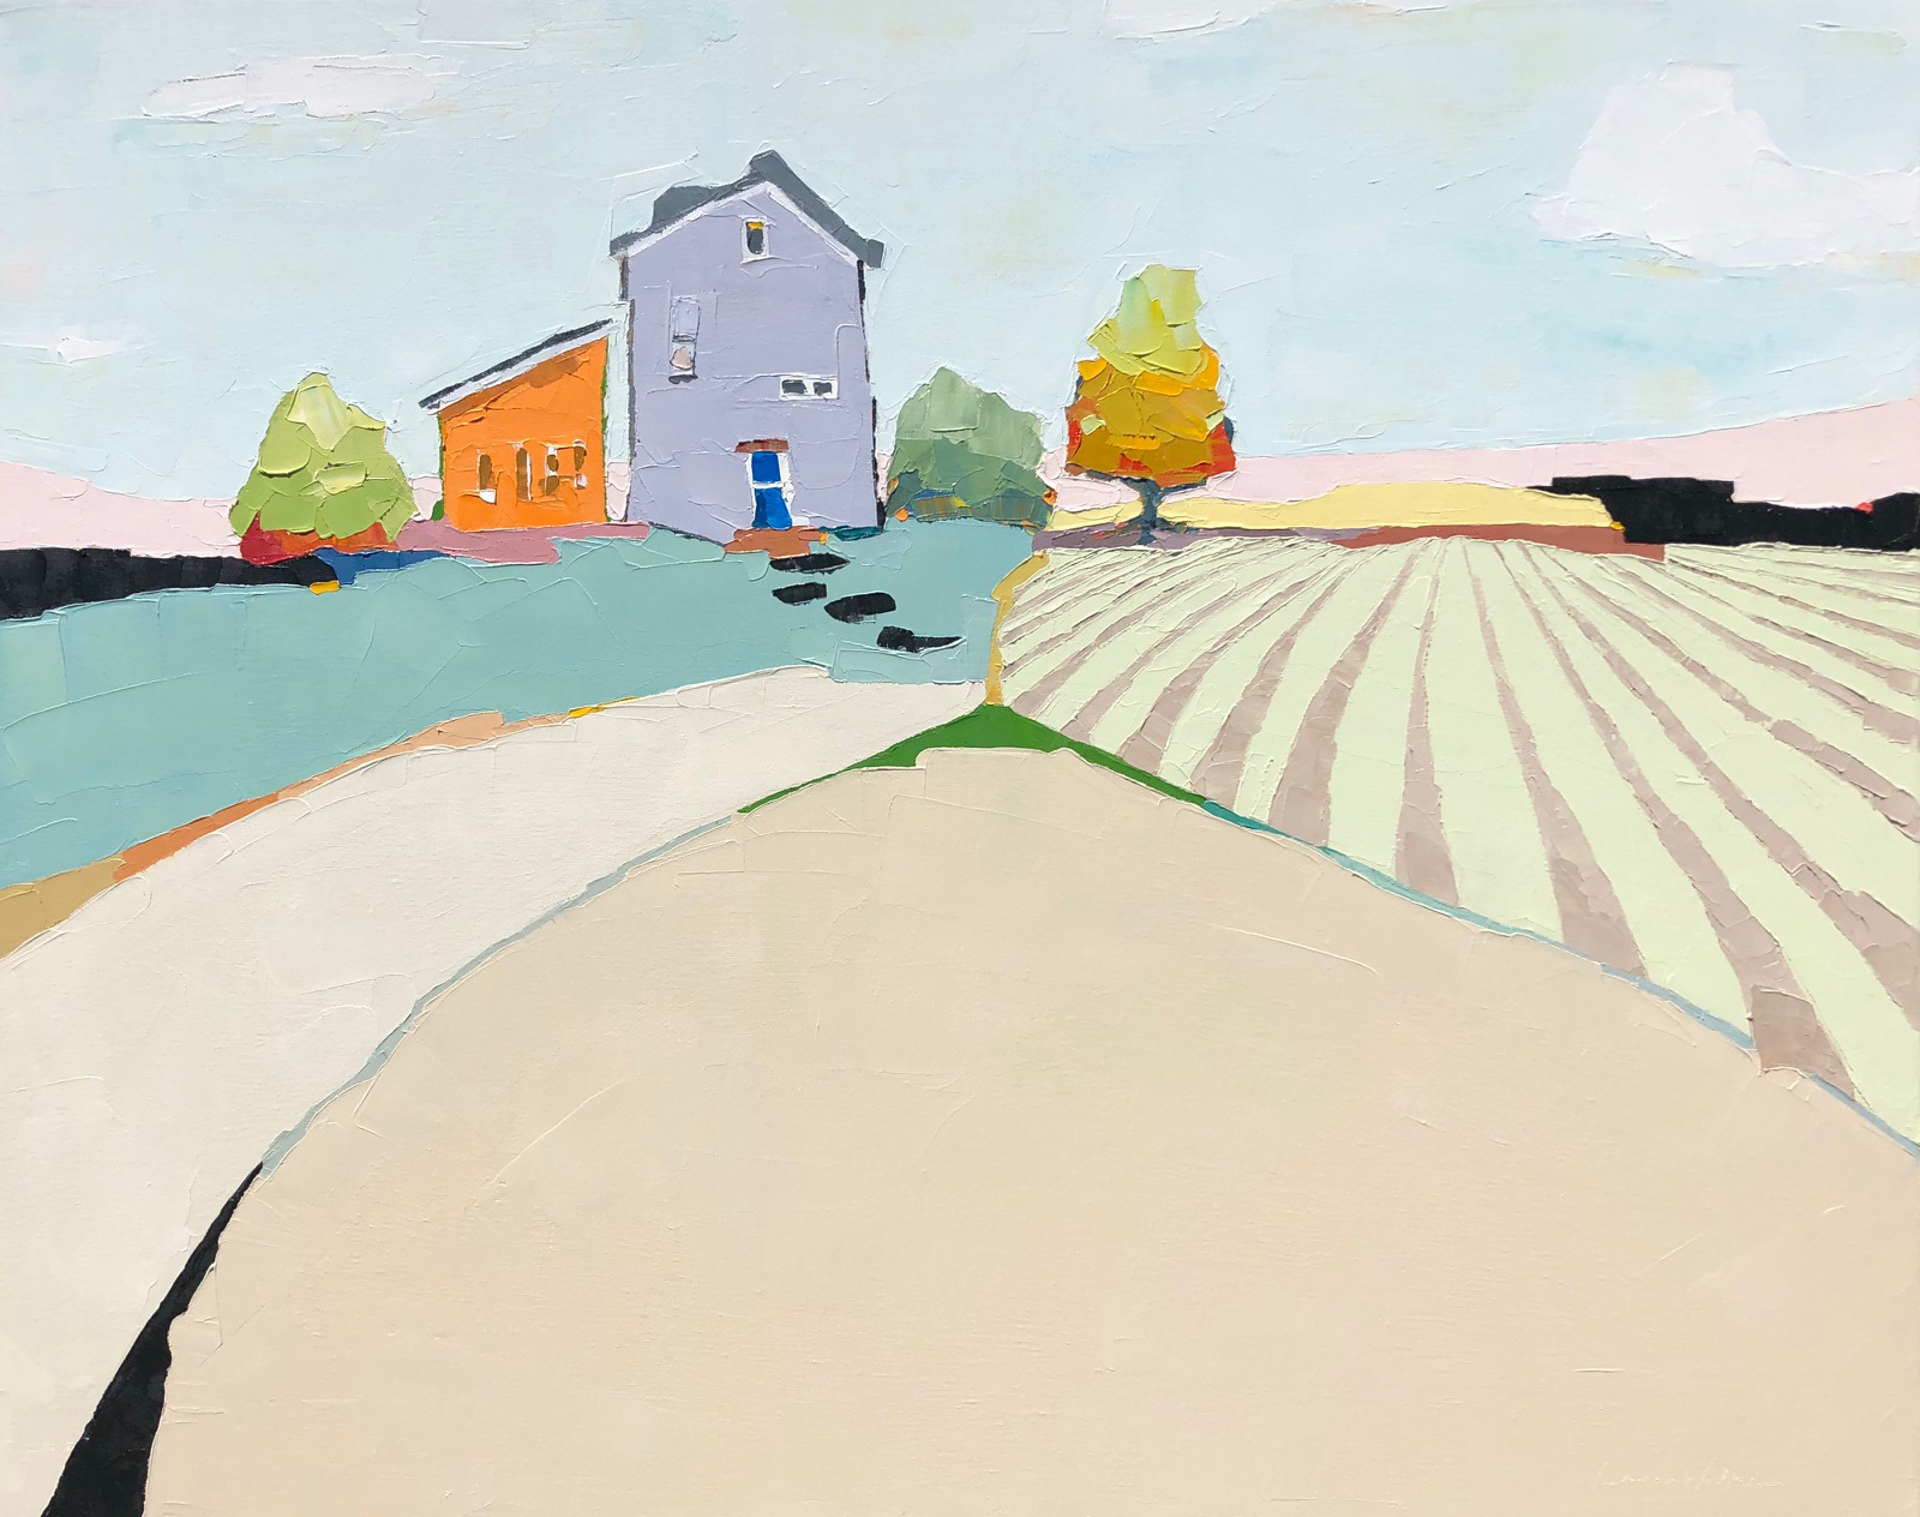 Lavender House by Donna Walker